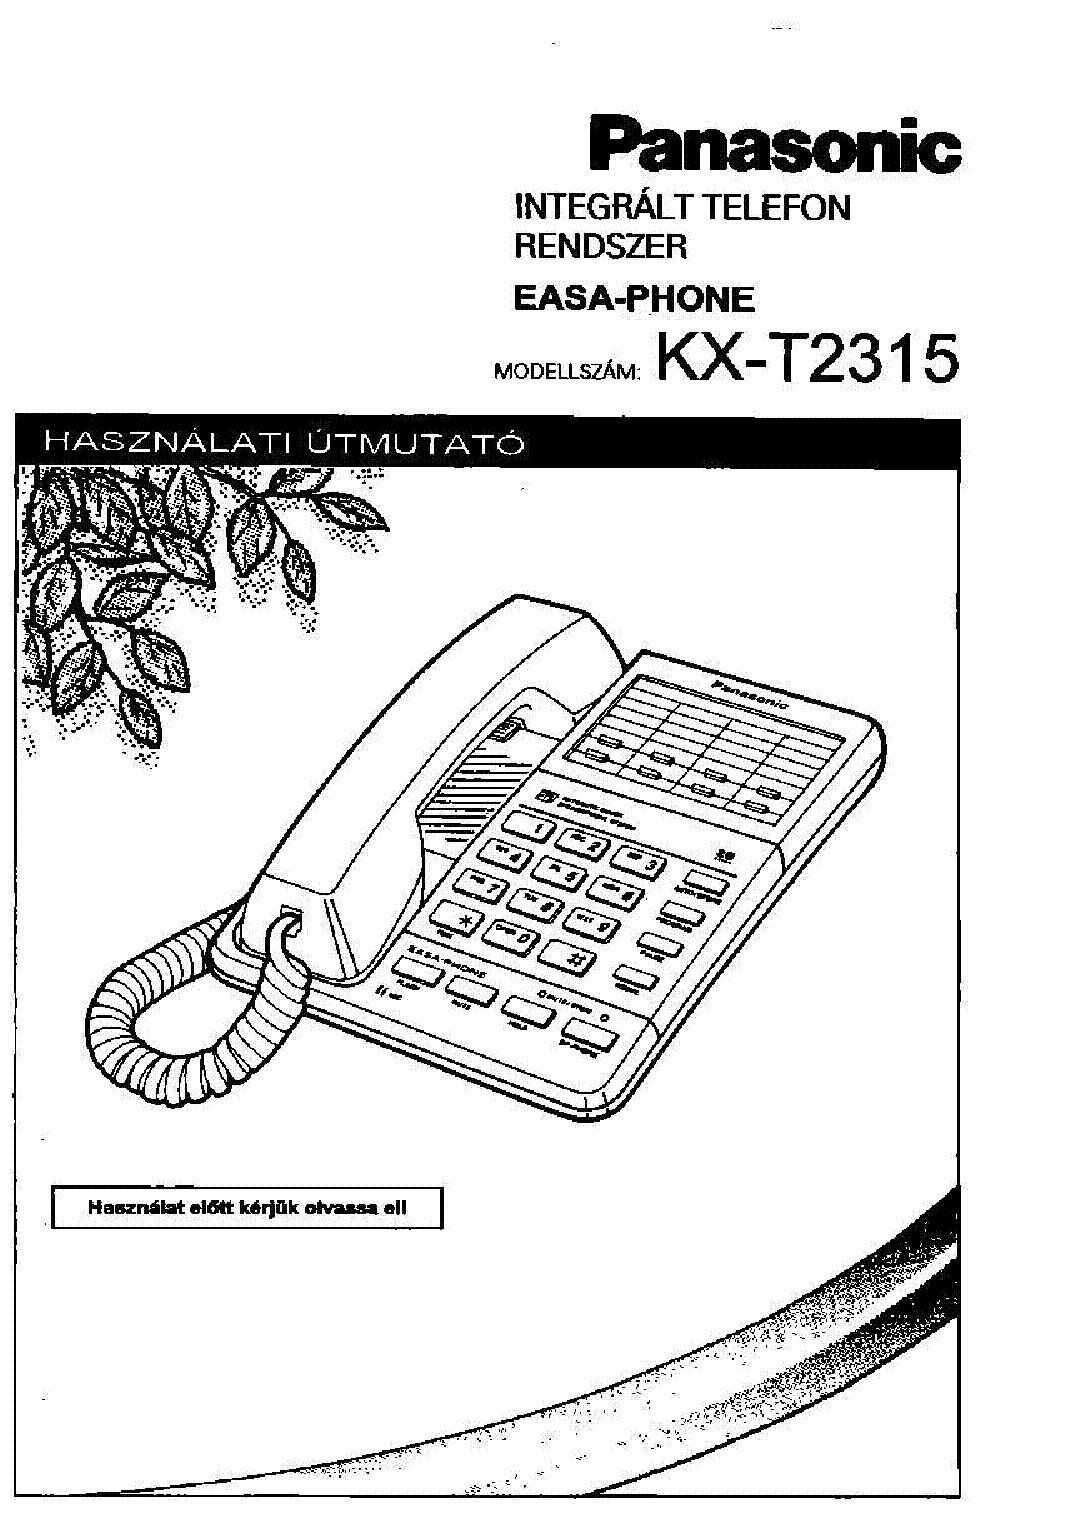 PANASONIC KX-T2315 HASZNALATI HUN Service Manual download